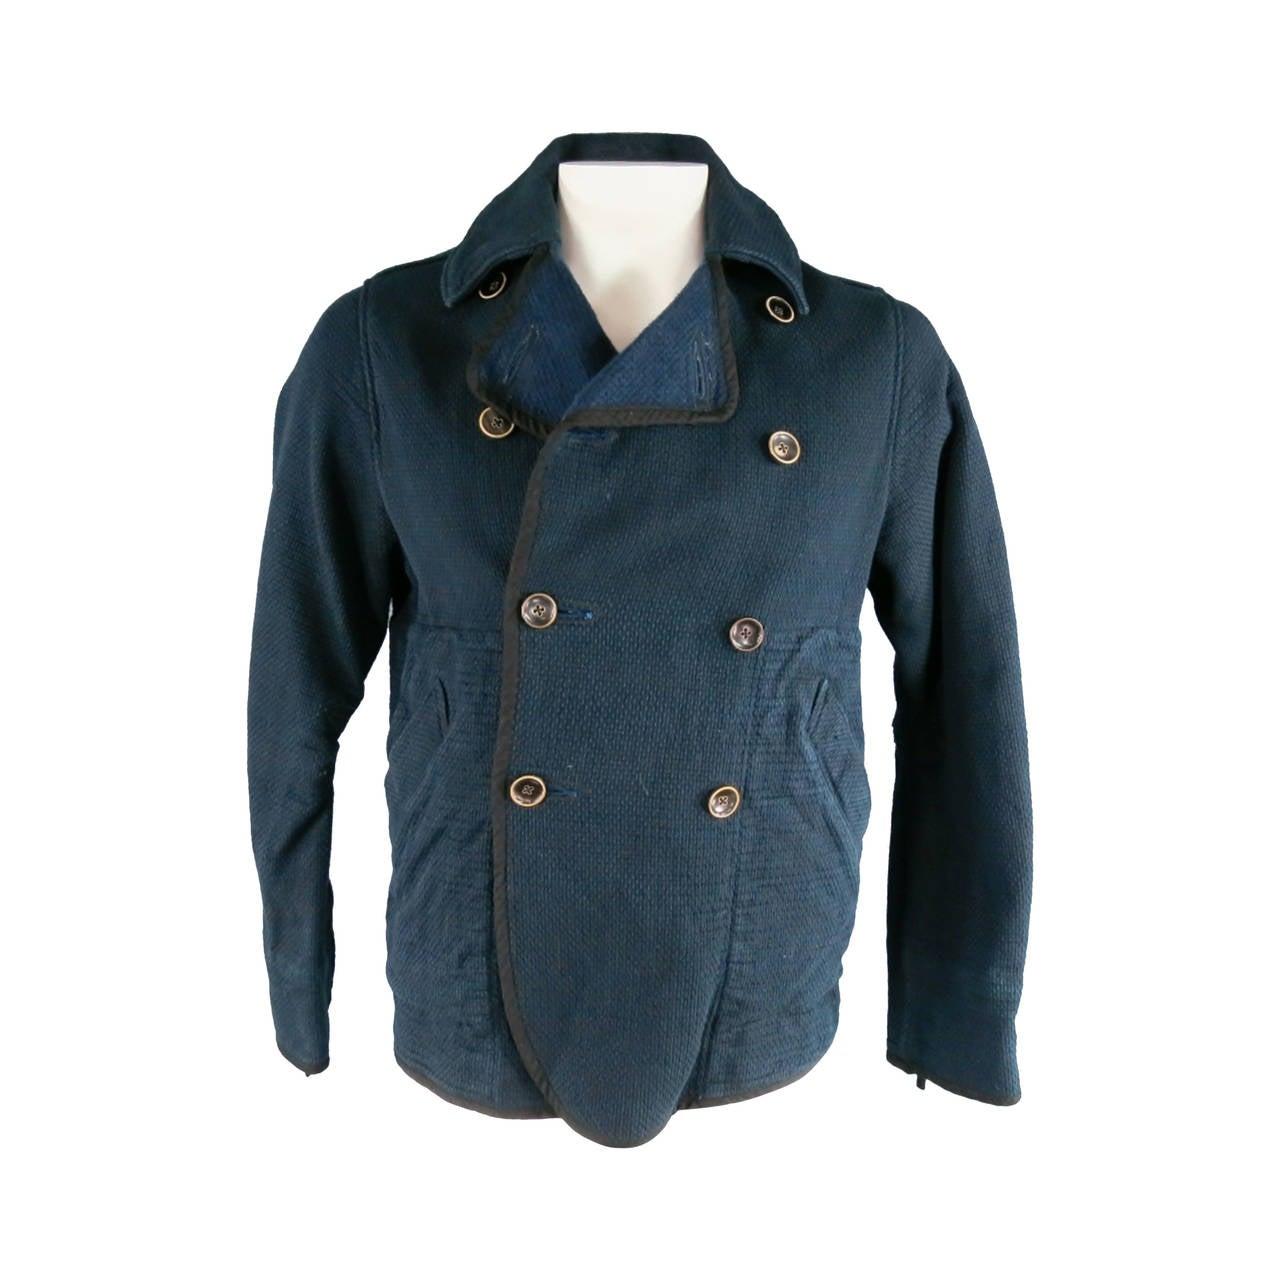 3a8760d8e036 KAPITAL 40 Indigo Cotton Canvas Double Breasted Peacoat Jacket For Sale